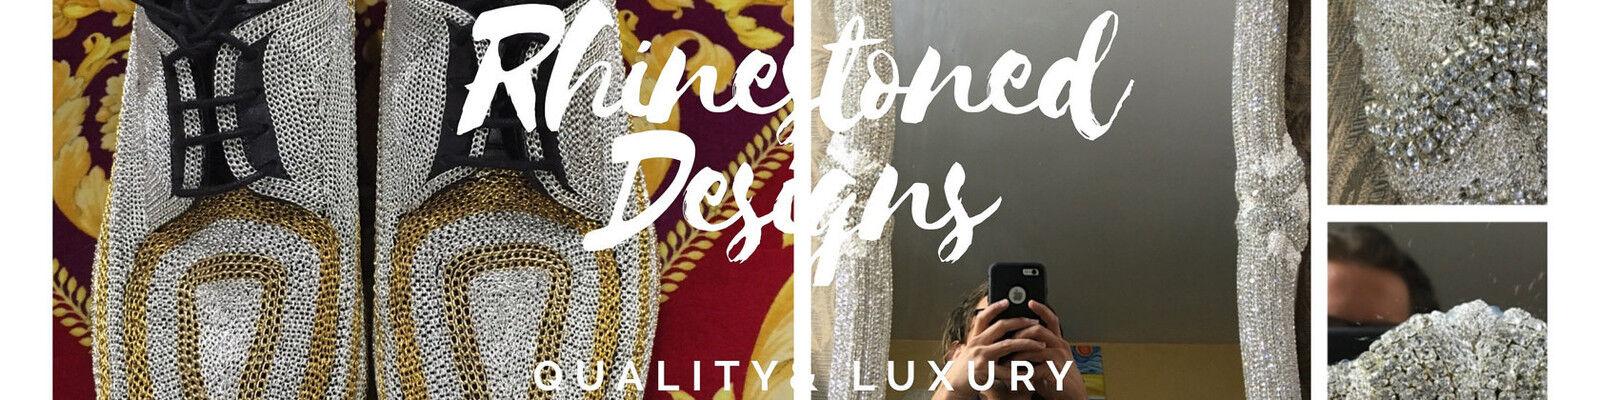 Rhinestoned Designs